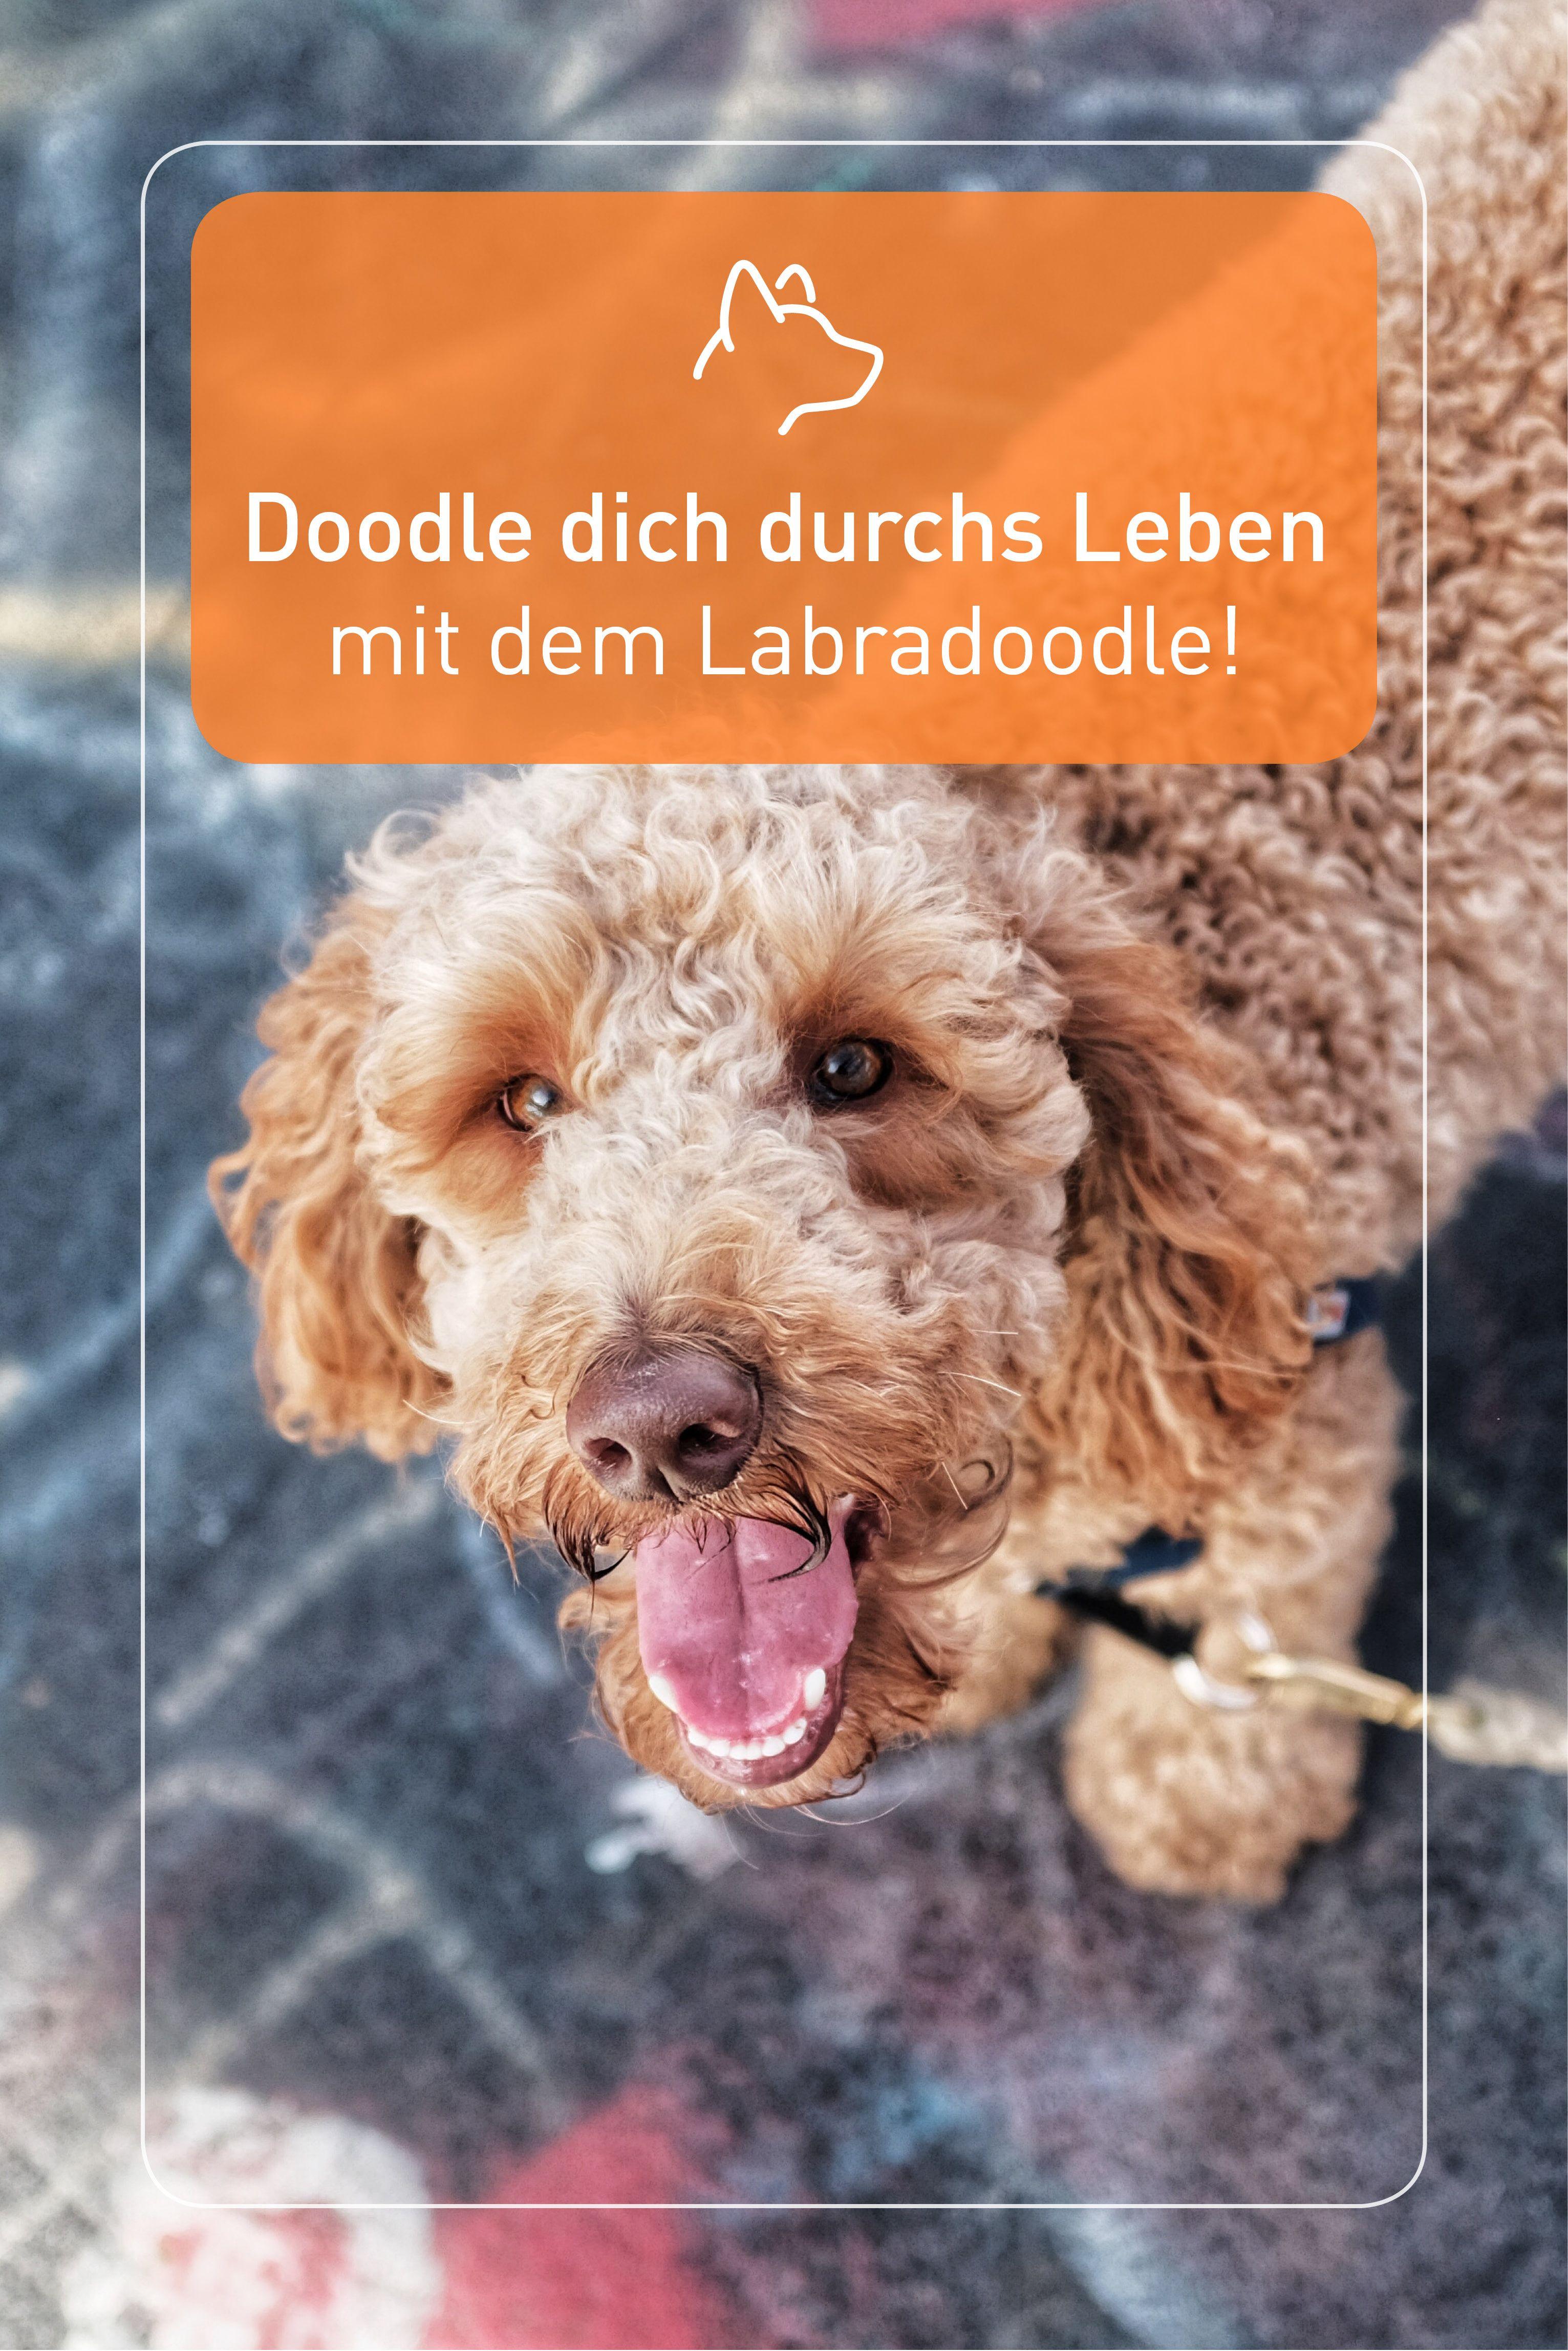 Doodle Dich Durchs Leben Mit Dem Labradoodle In 2020 Familienhund Labradoodle Hunde